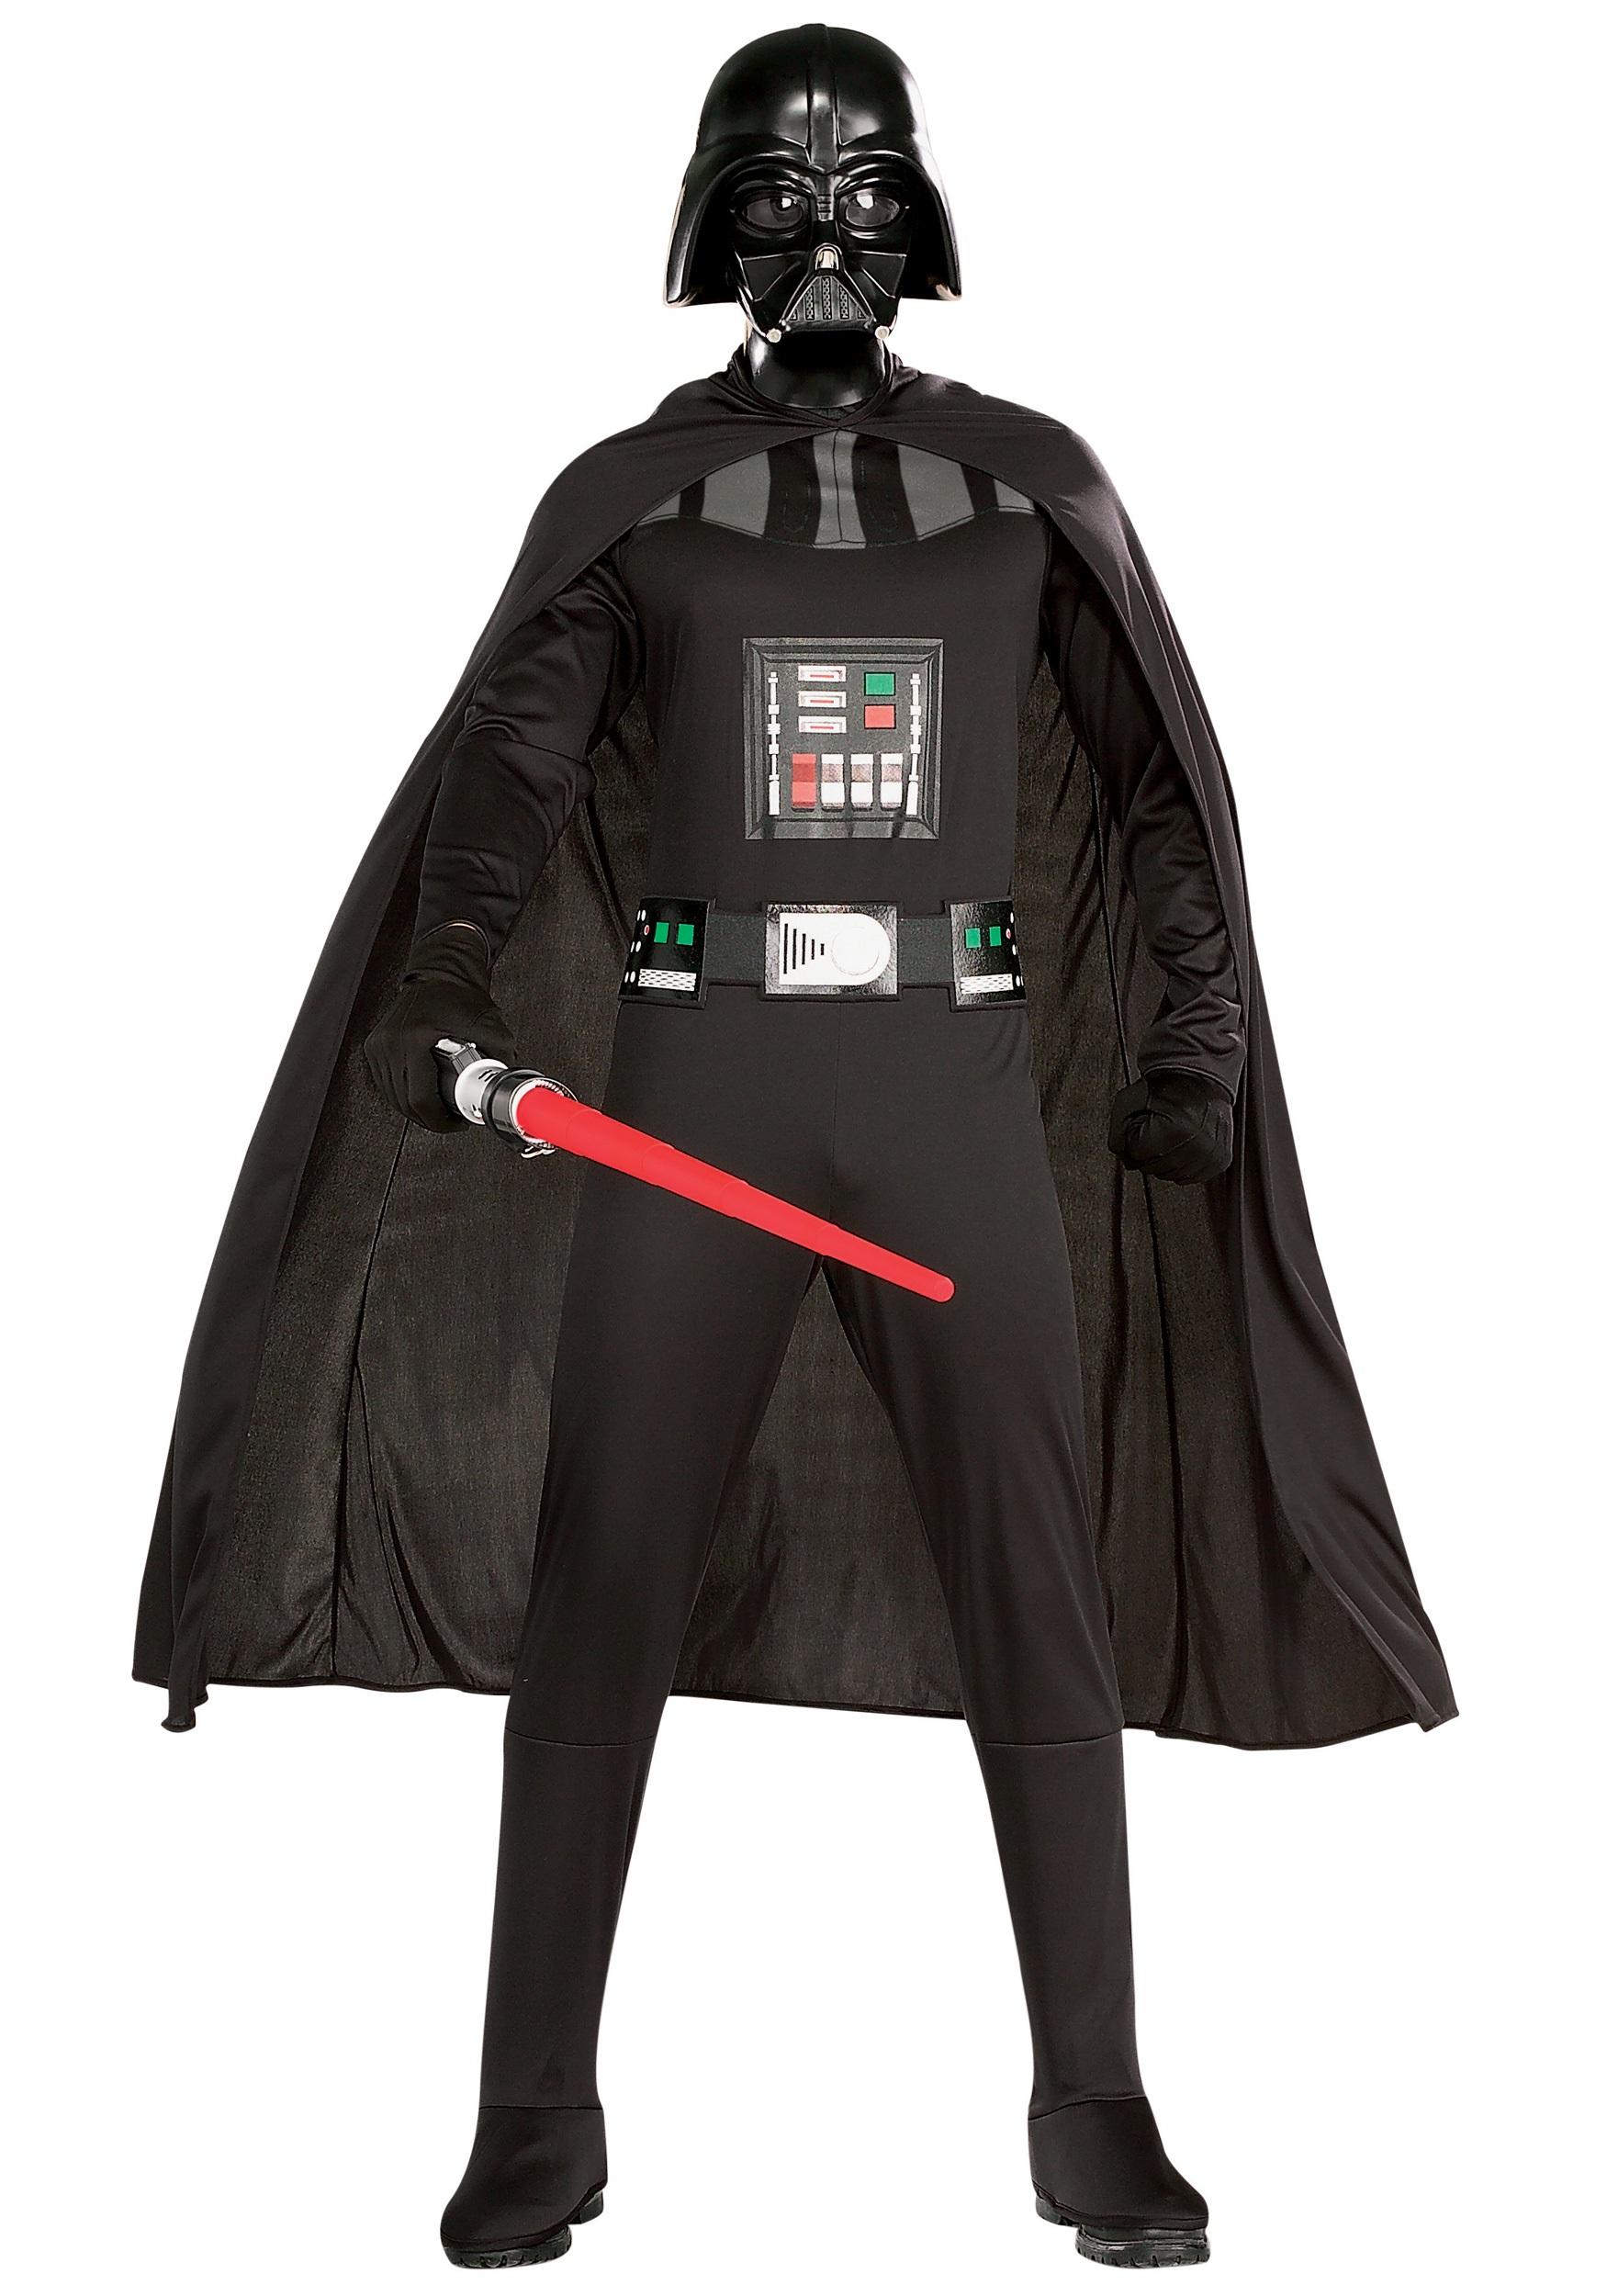 наоборот новогодний костюм дарт вейдер купить спортивное термобелье